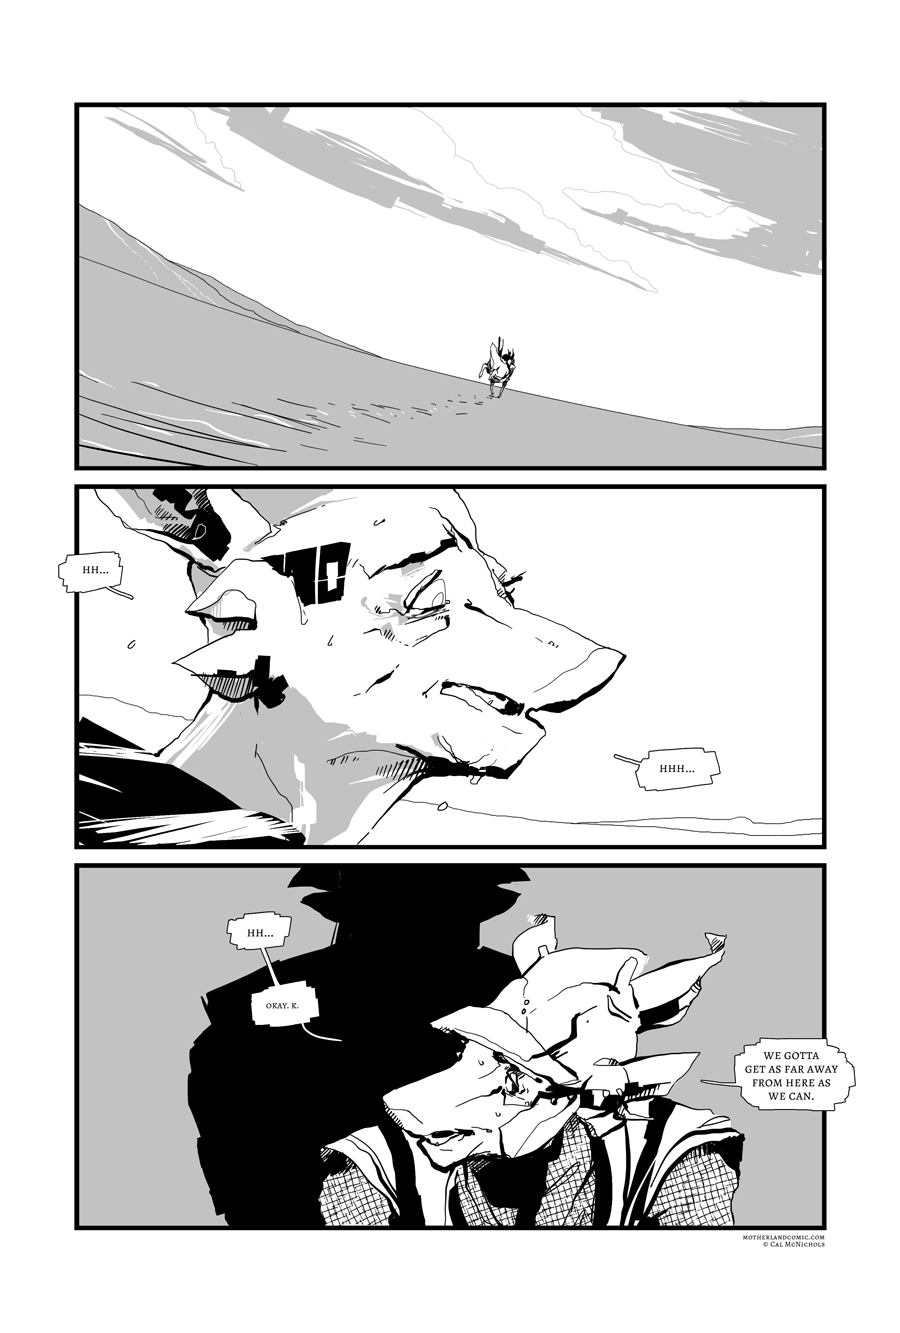 pg 44